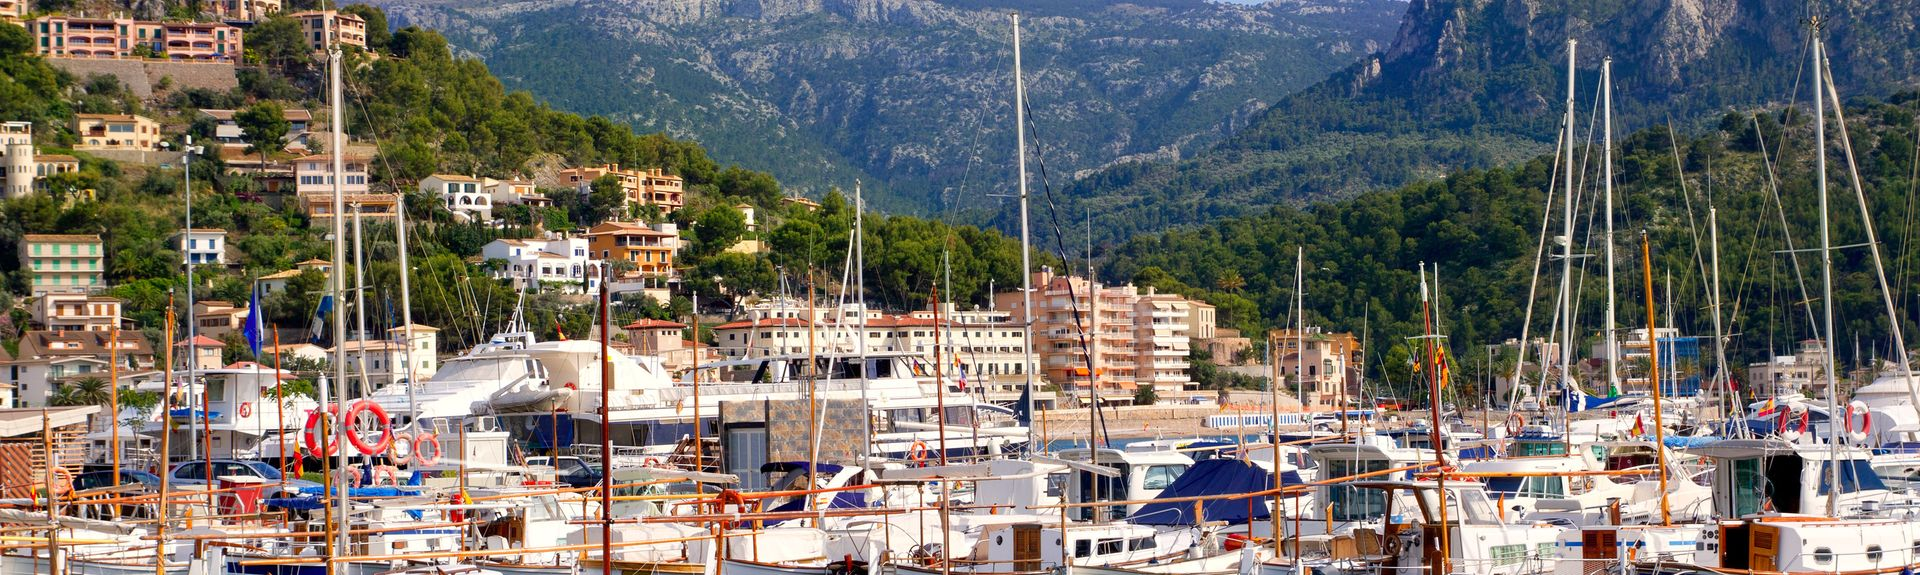 Port de Sóller, Sóller, Balearic Islands, Spain